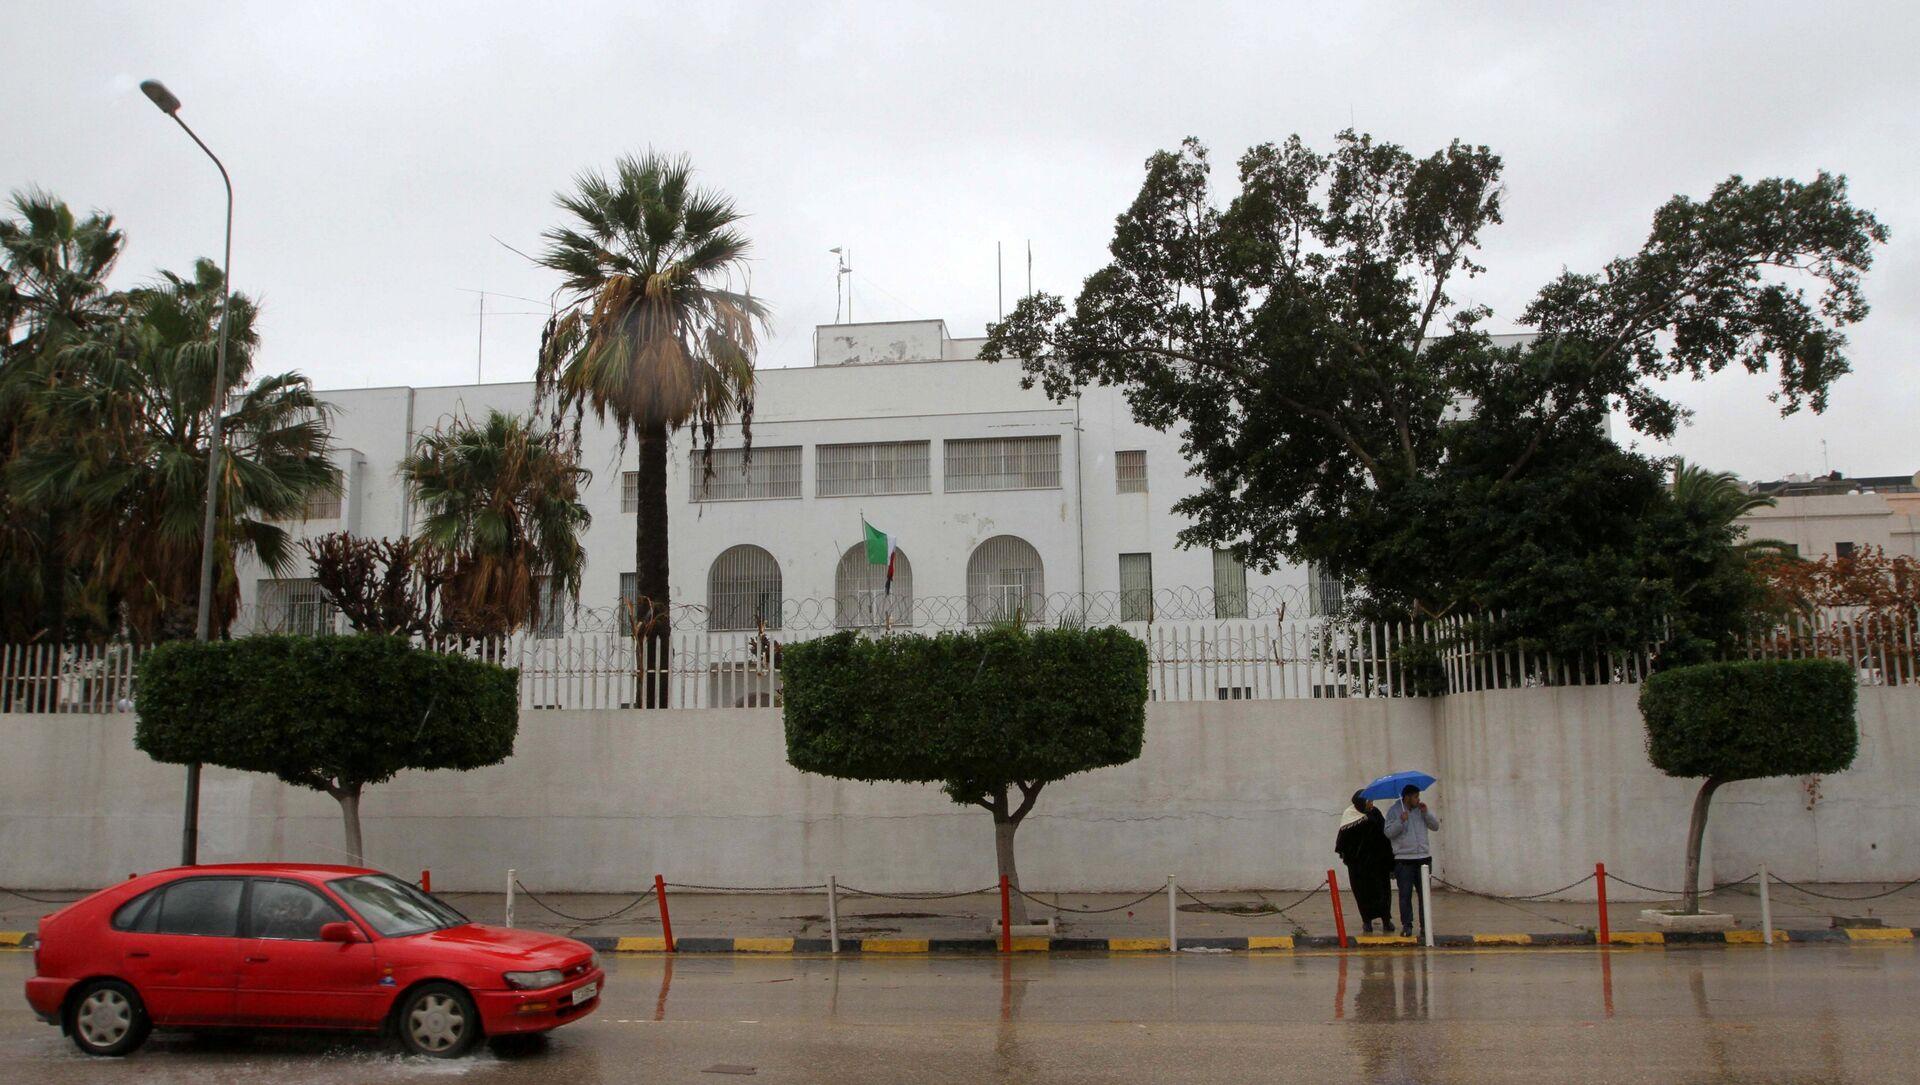 L'Ambasciata italiana a Tripoli, Libia (foto d'archivio) - Sputnik Italia, 1920, 18.05.2021